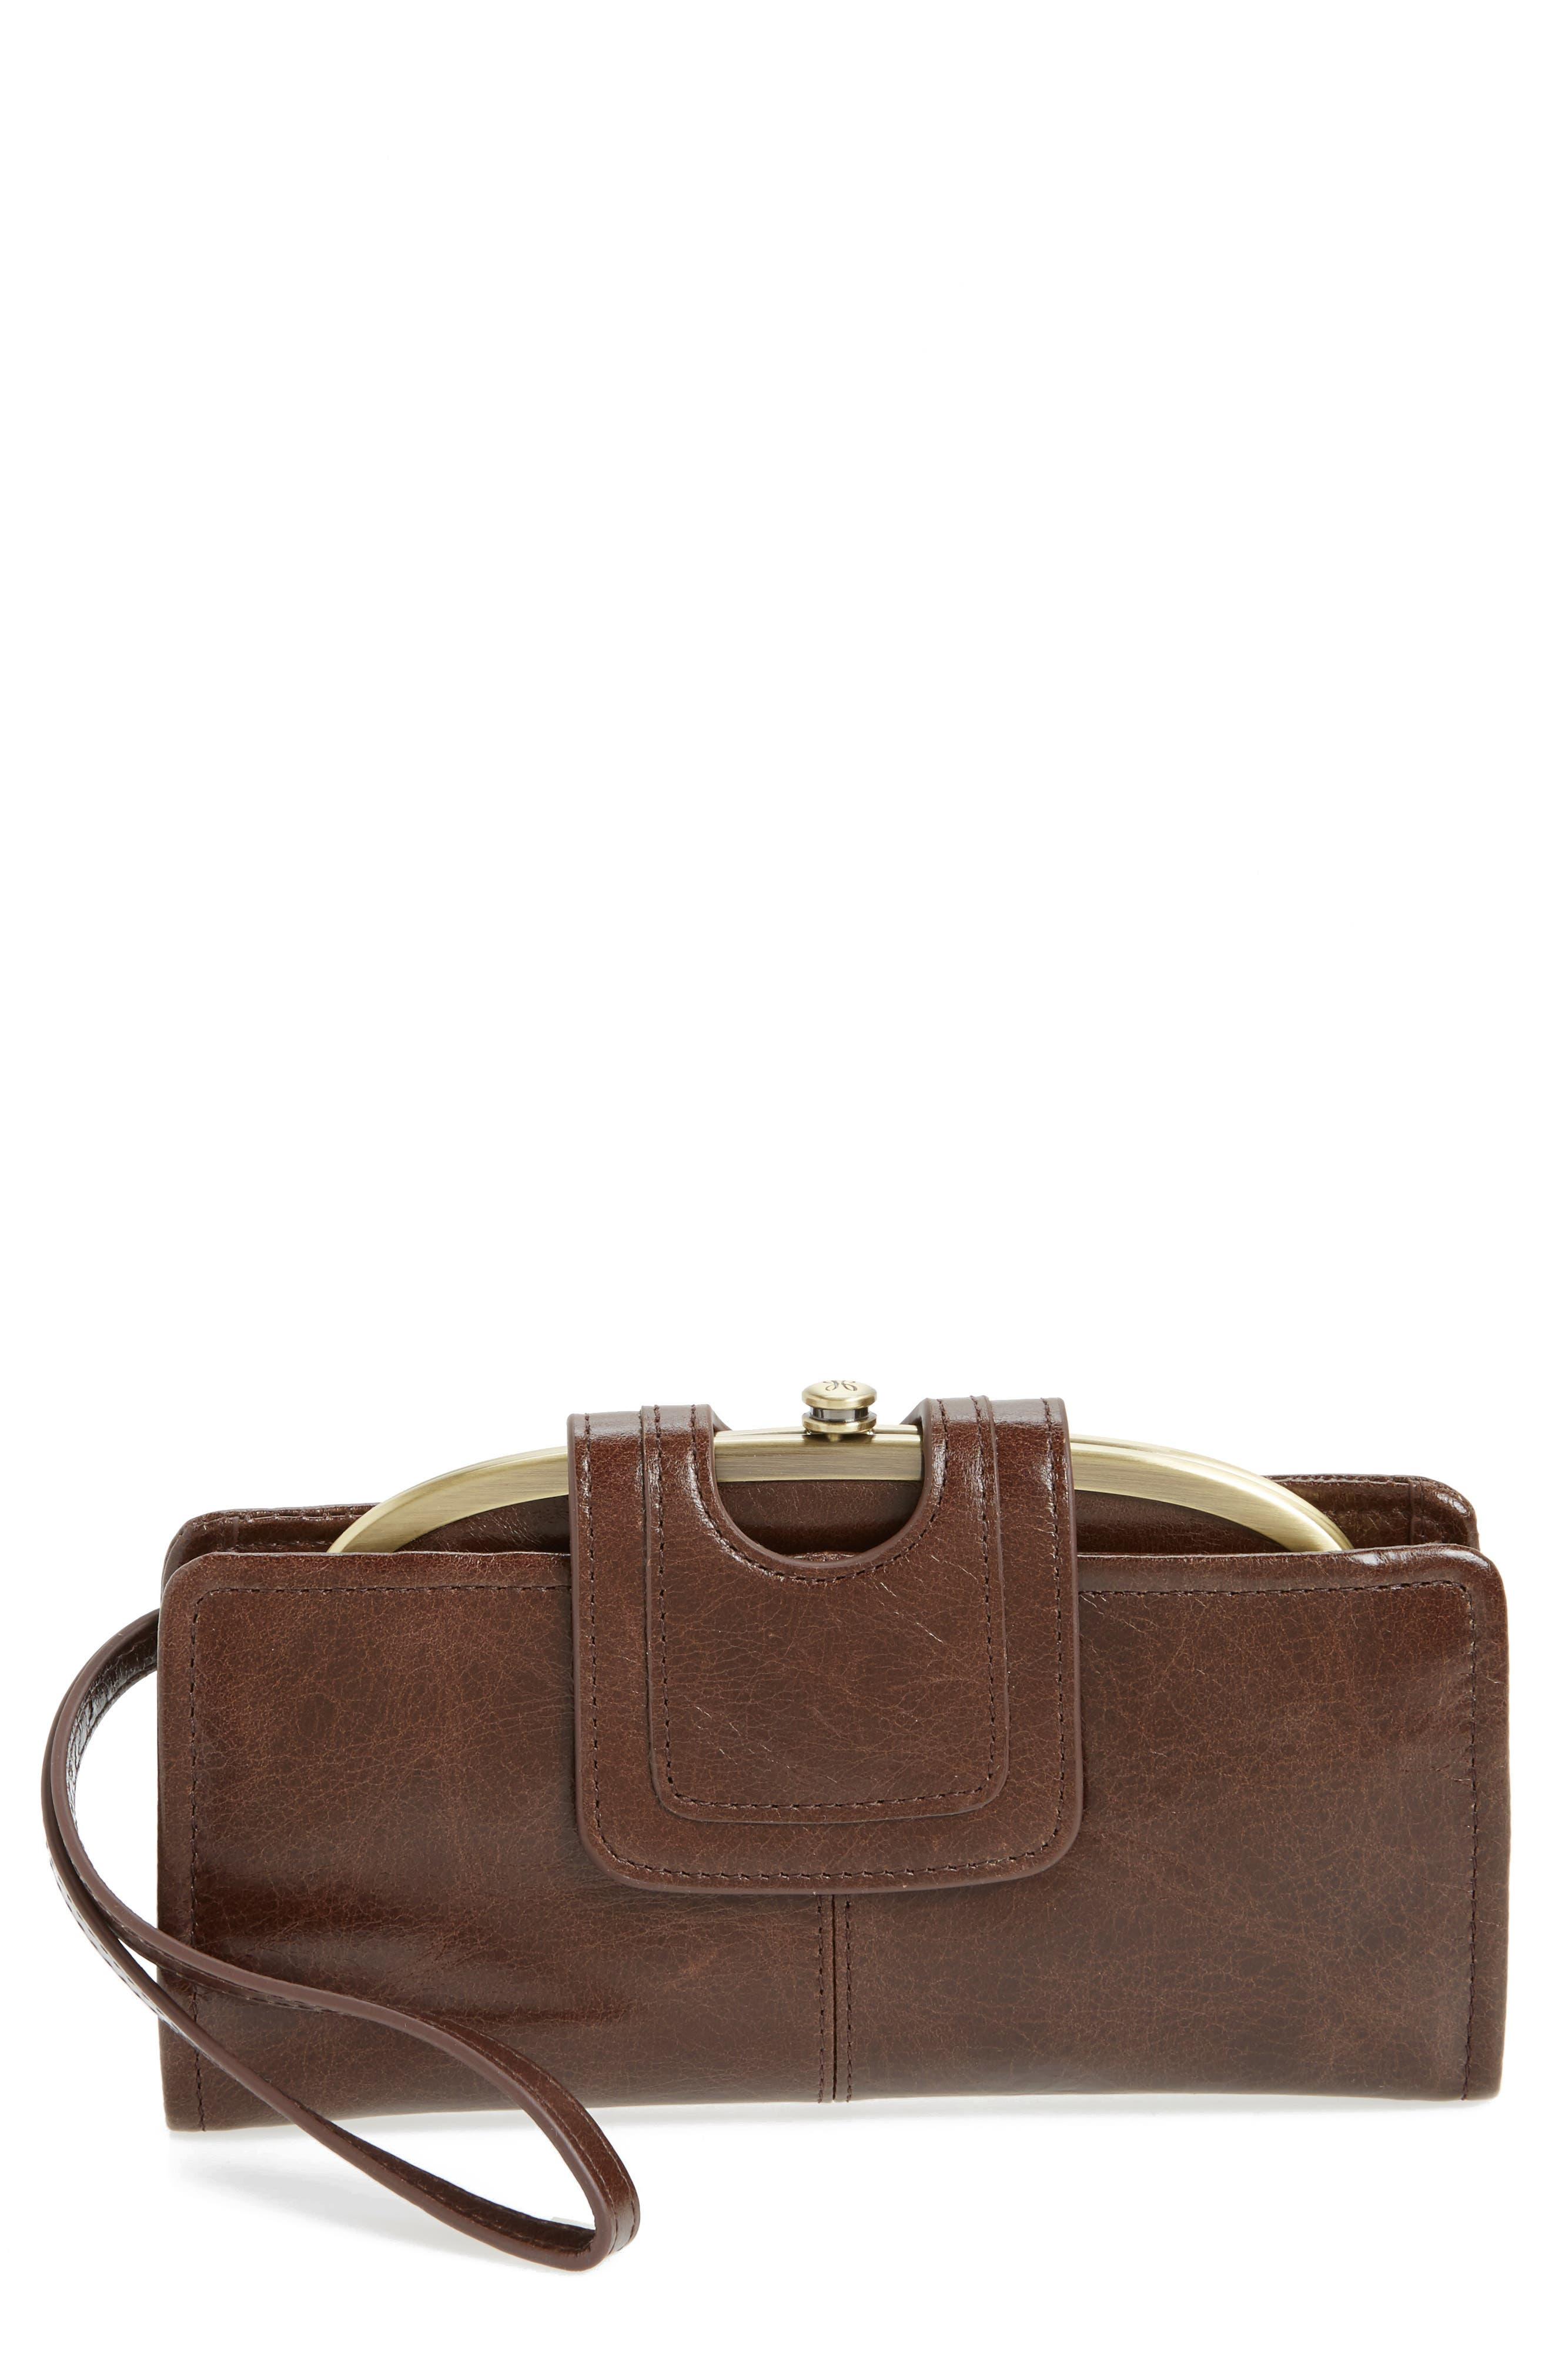 Alternate Image 1 Selected - Hobo Nova Calfskin Leather Wallet